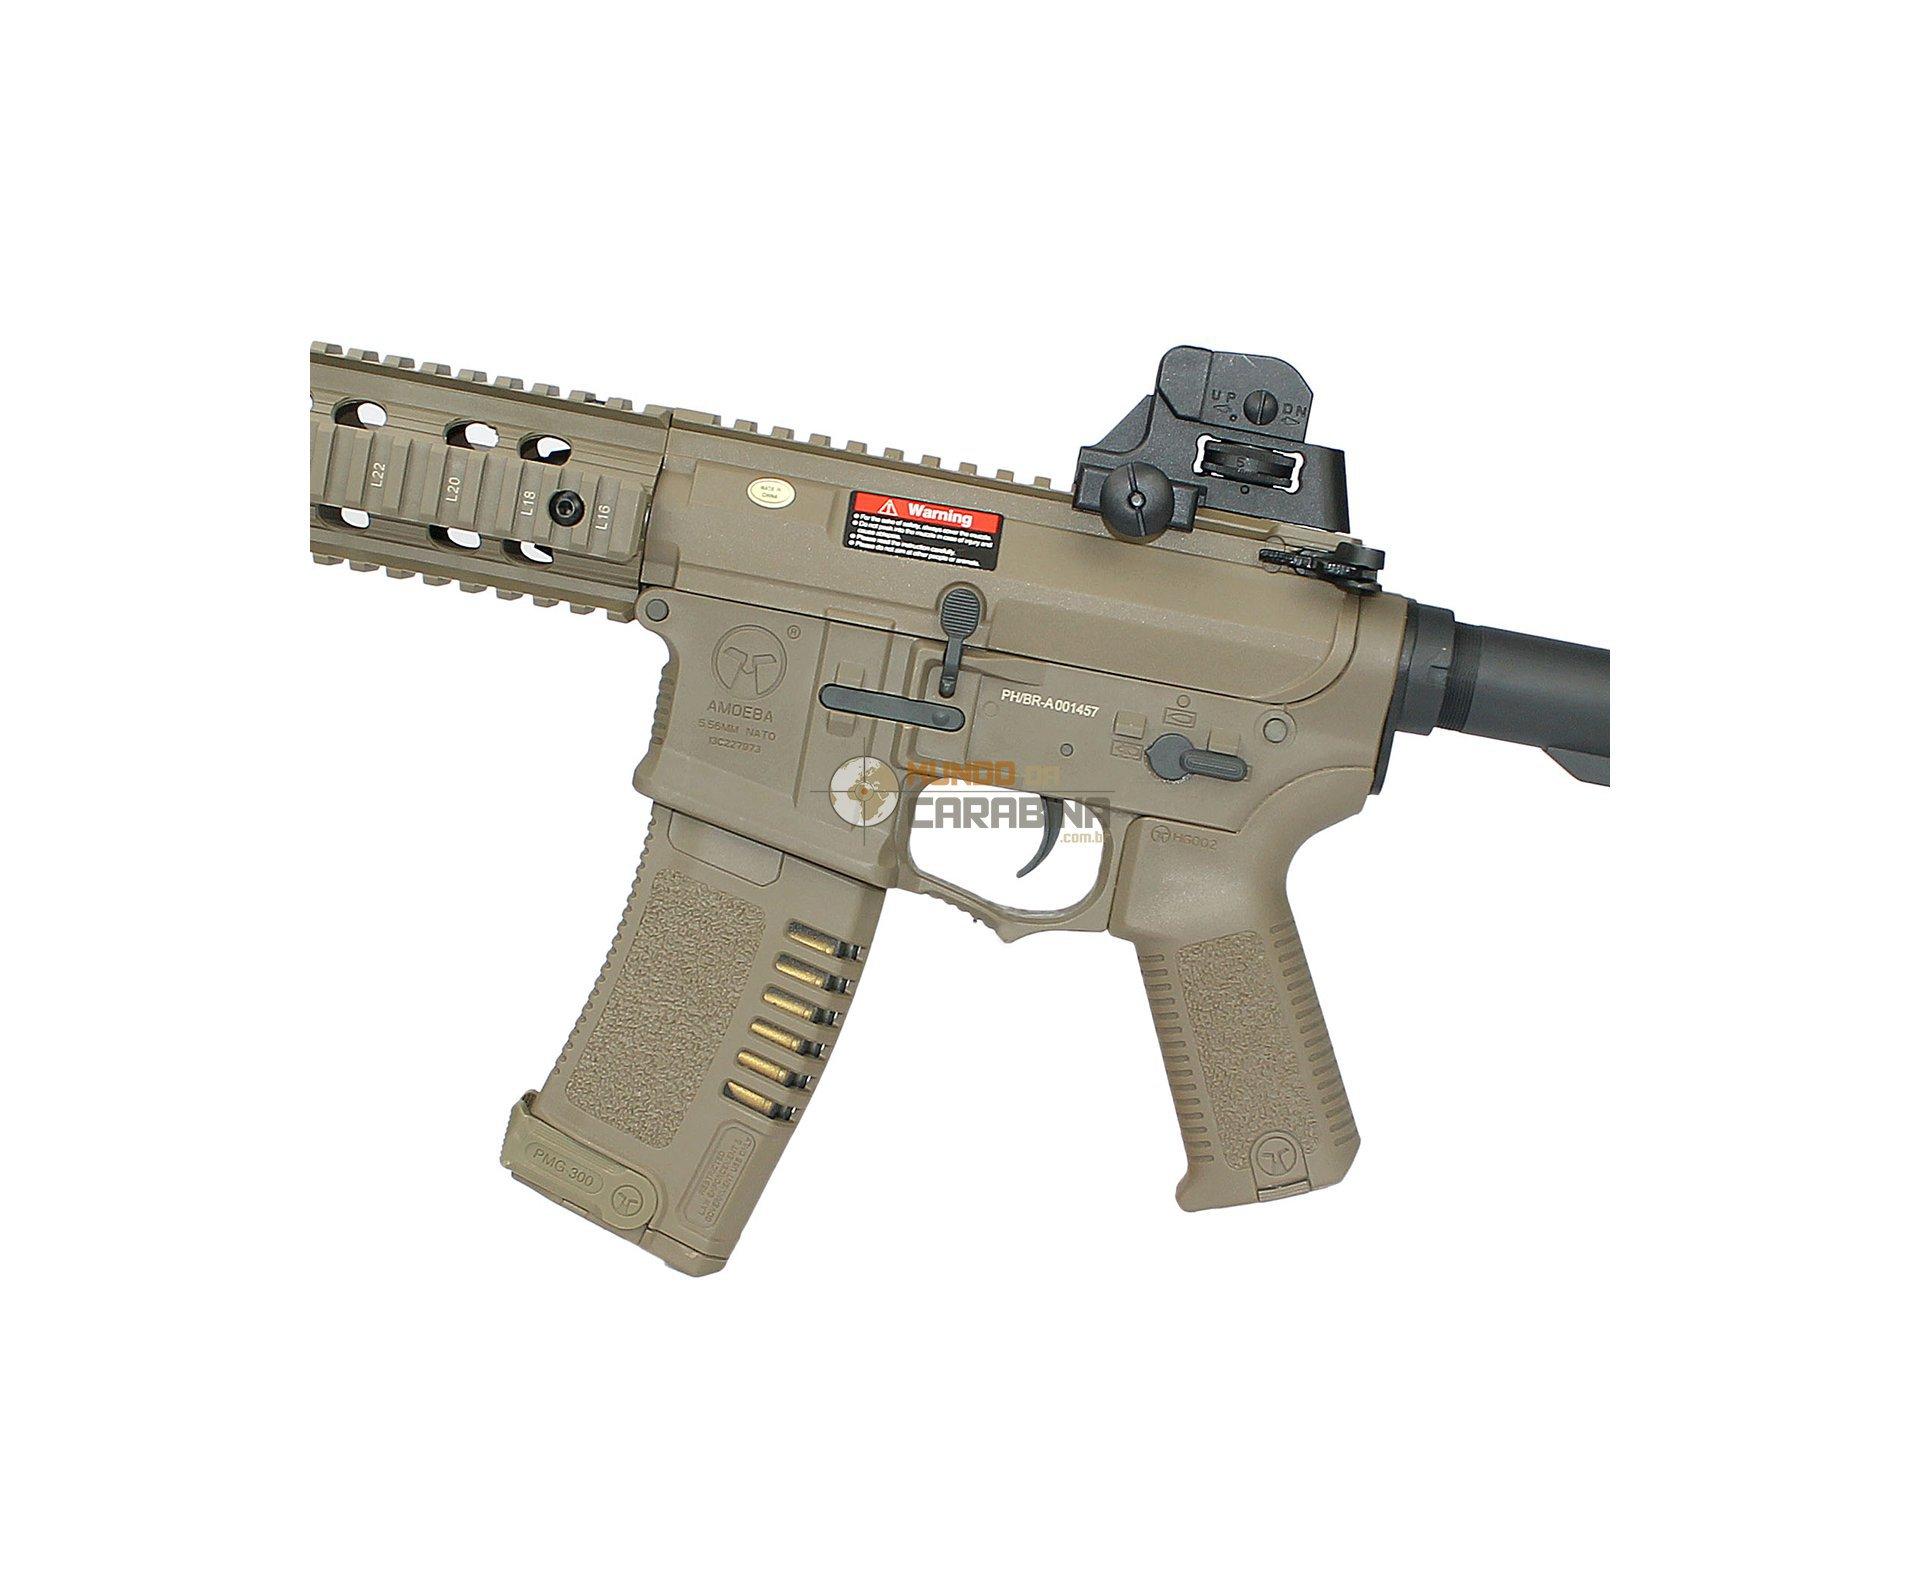 Rifle De Airsoft M4 Cqb Ris Amoeba Am-008-de- Cal 6.0mm - Ares